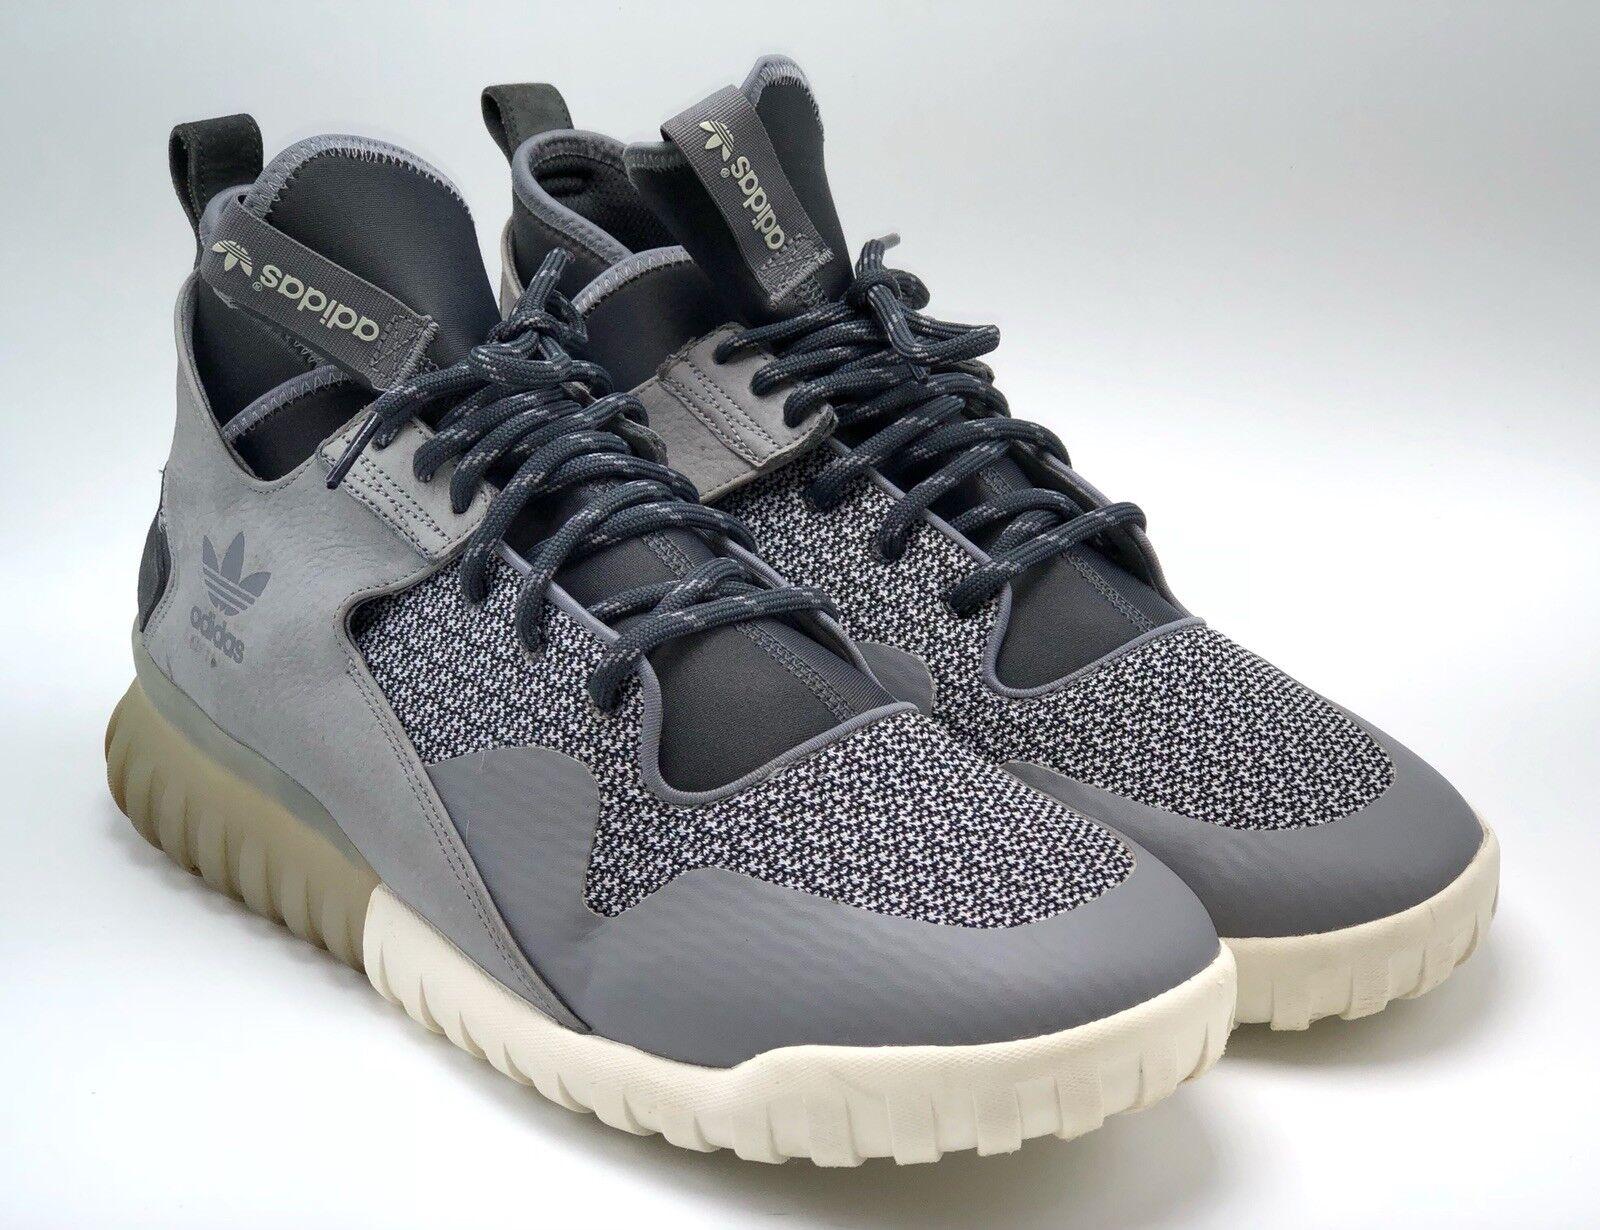 Adidas Originals Hombre Tubular X S74927 Sneakers Gris Hombre Originals Zapatos Talla US ae10a8